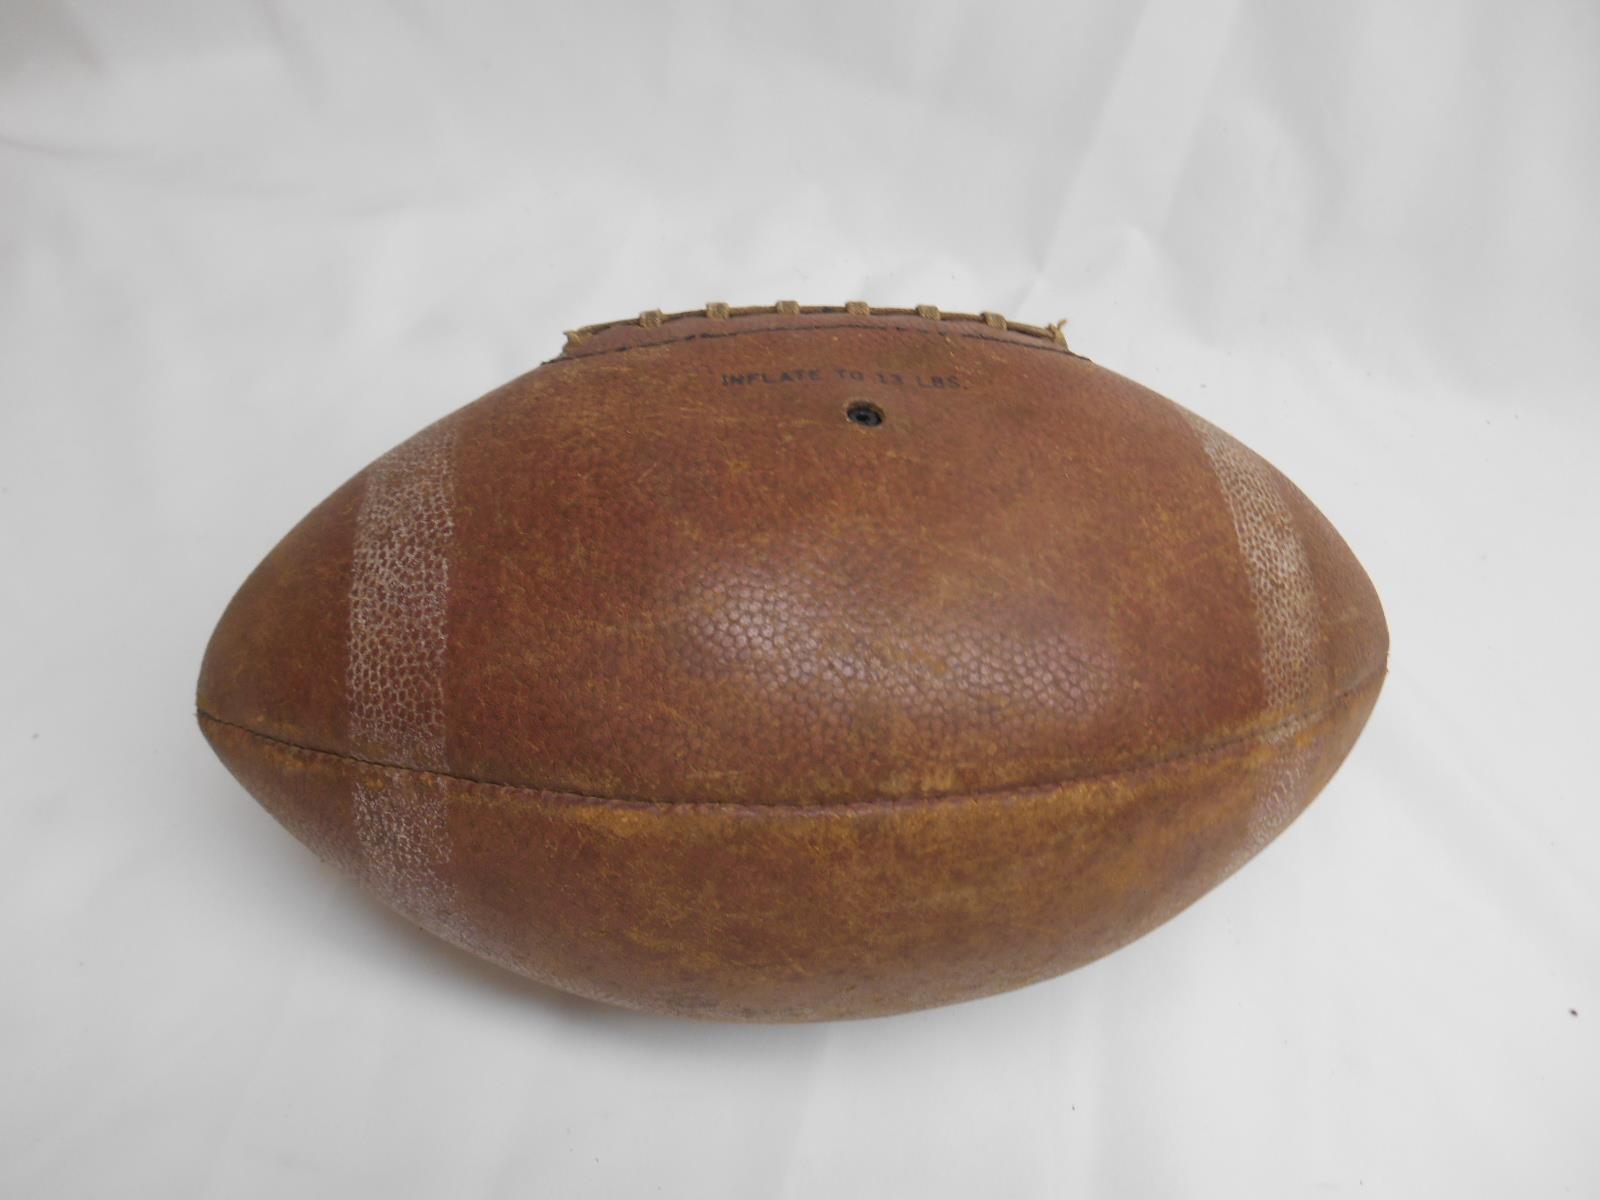 Old Vtg SPALDING FOOTBALL Pigskin Varsity #338 GARY COLLINS AUTOGRAPH Model Ball